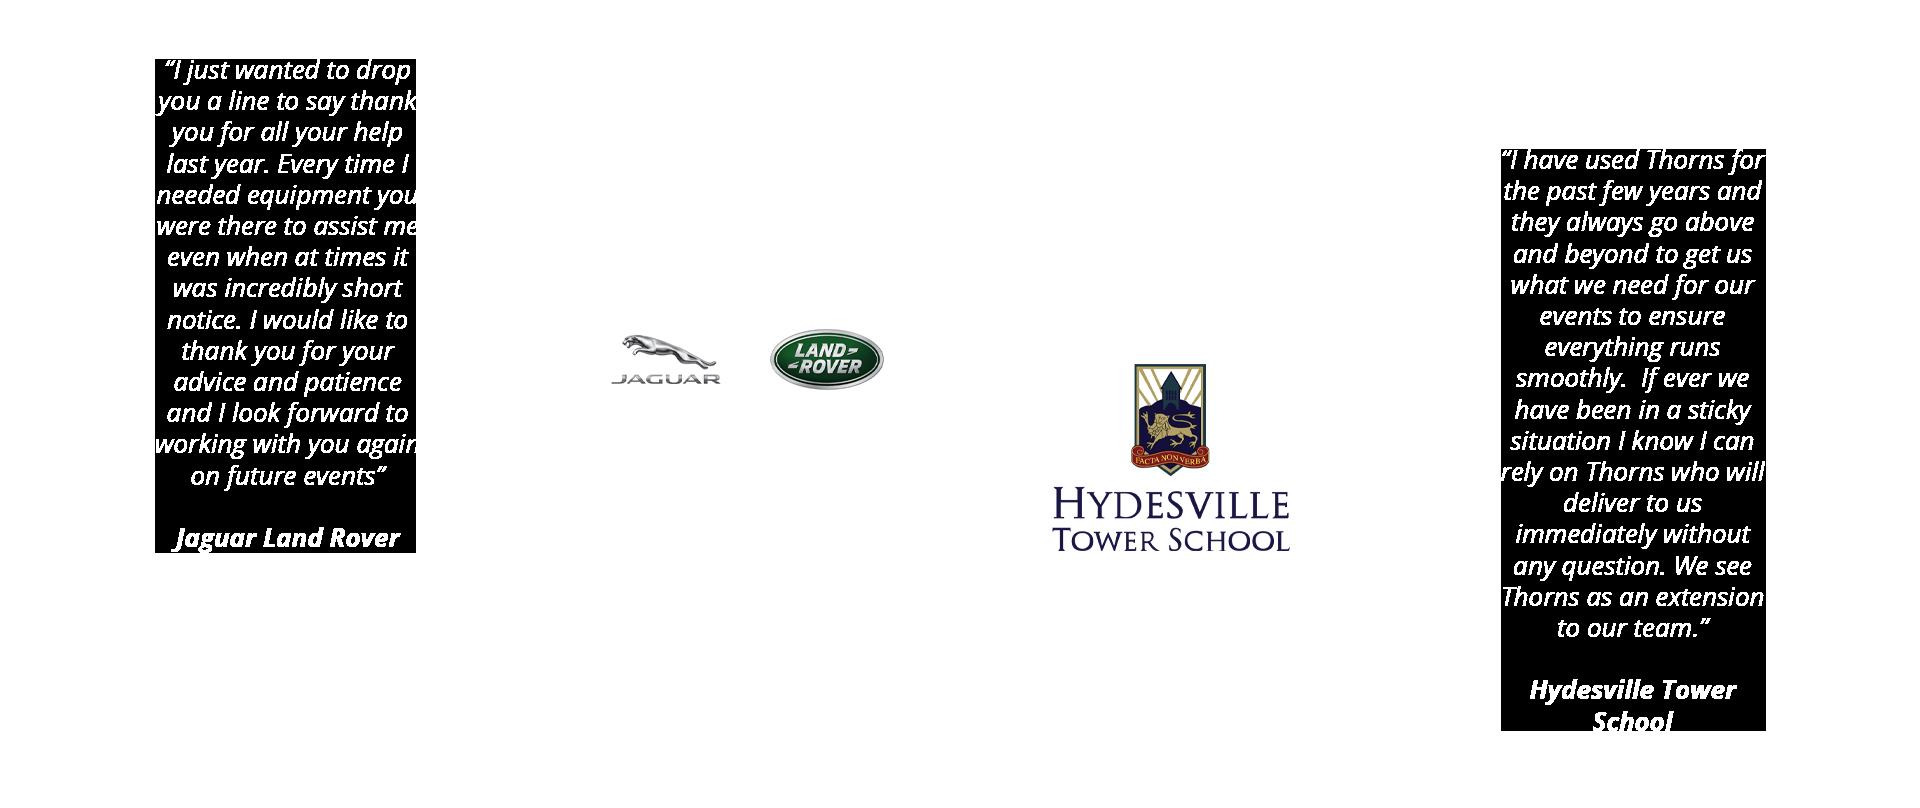 Jaguar Landrover Hydesville Tower School Testimonials